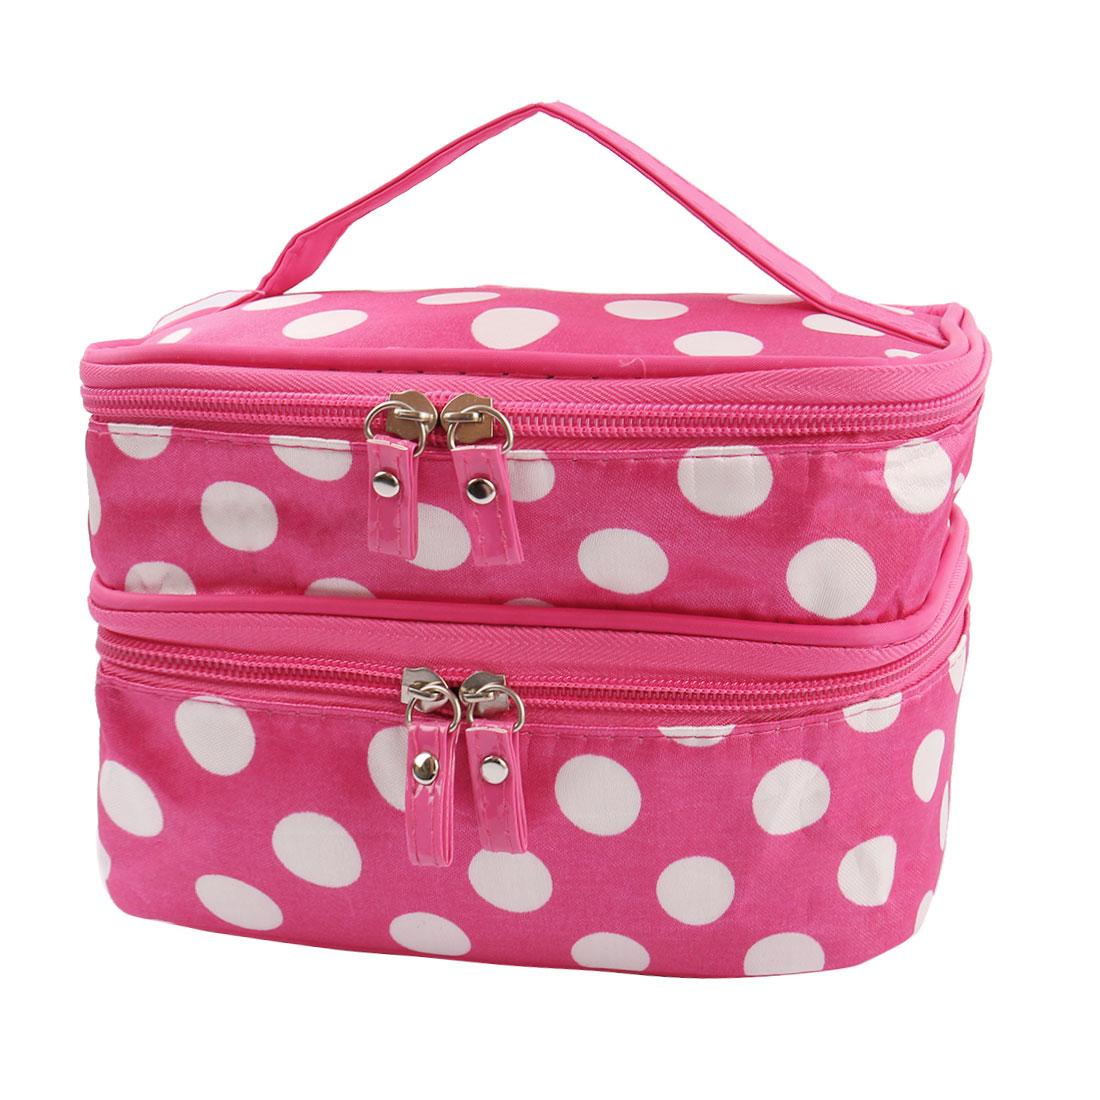 Zipped Cosmetic Bag Double Layer Make Up Case Handbag Pouch (Fuchsia+White Dots)